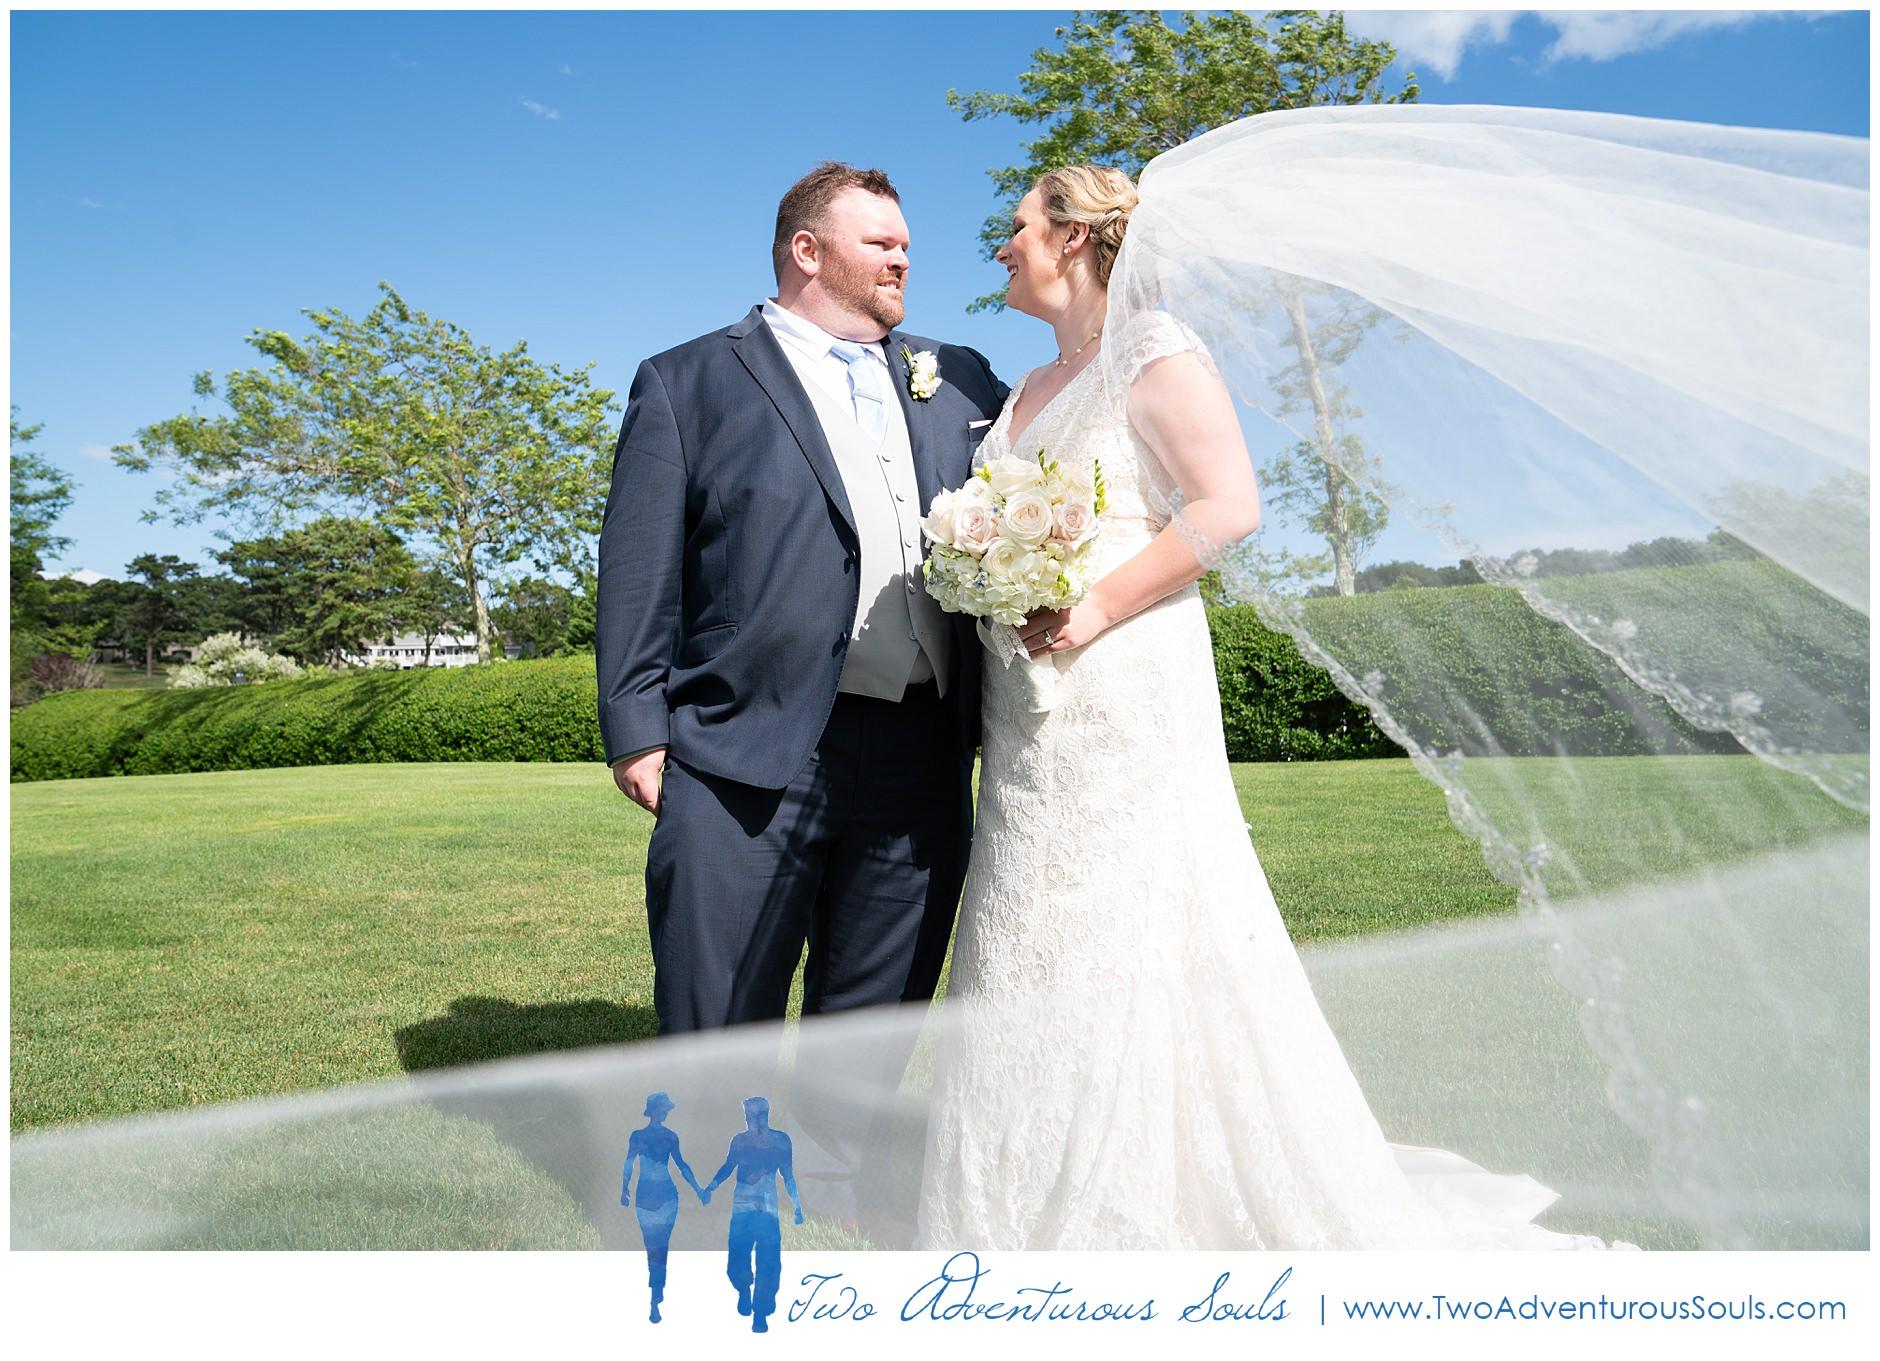 Cape Cod Wedding Photographers, Destination Wedding Photographers, Two Adventurous Souls-081019_0039.jpg